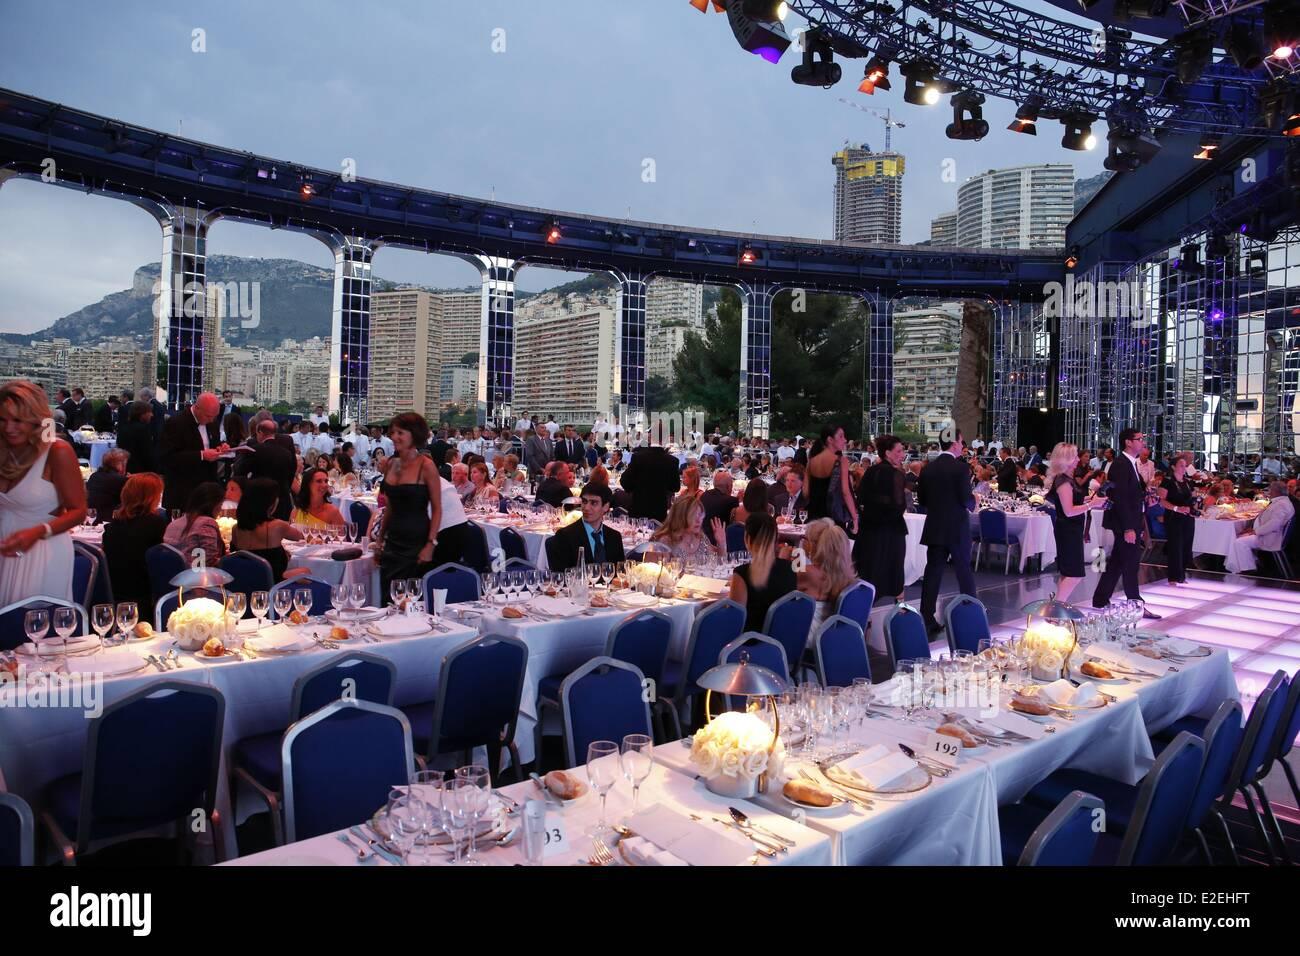 Europe Principality of Monaco Rod Steward recital and Diner at Winter Sporting Venue property of SBM (Societe des - Stock Image